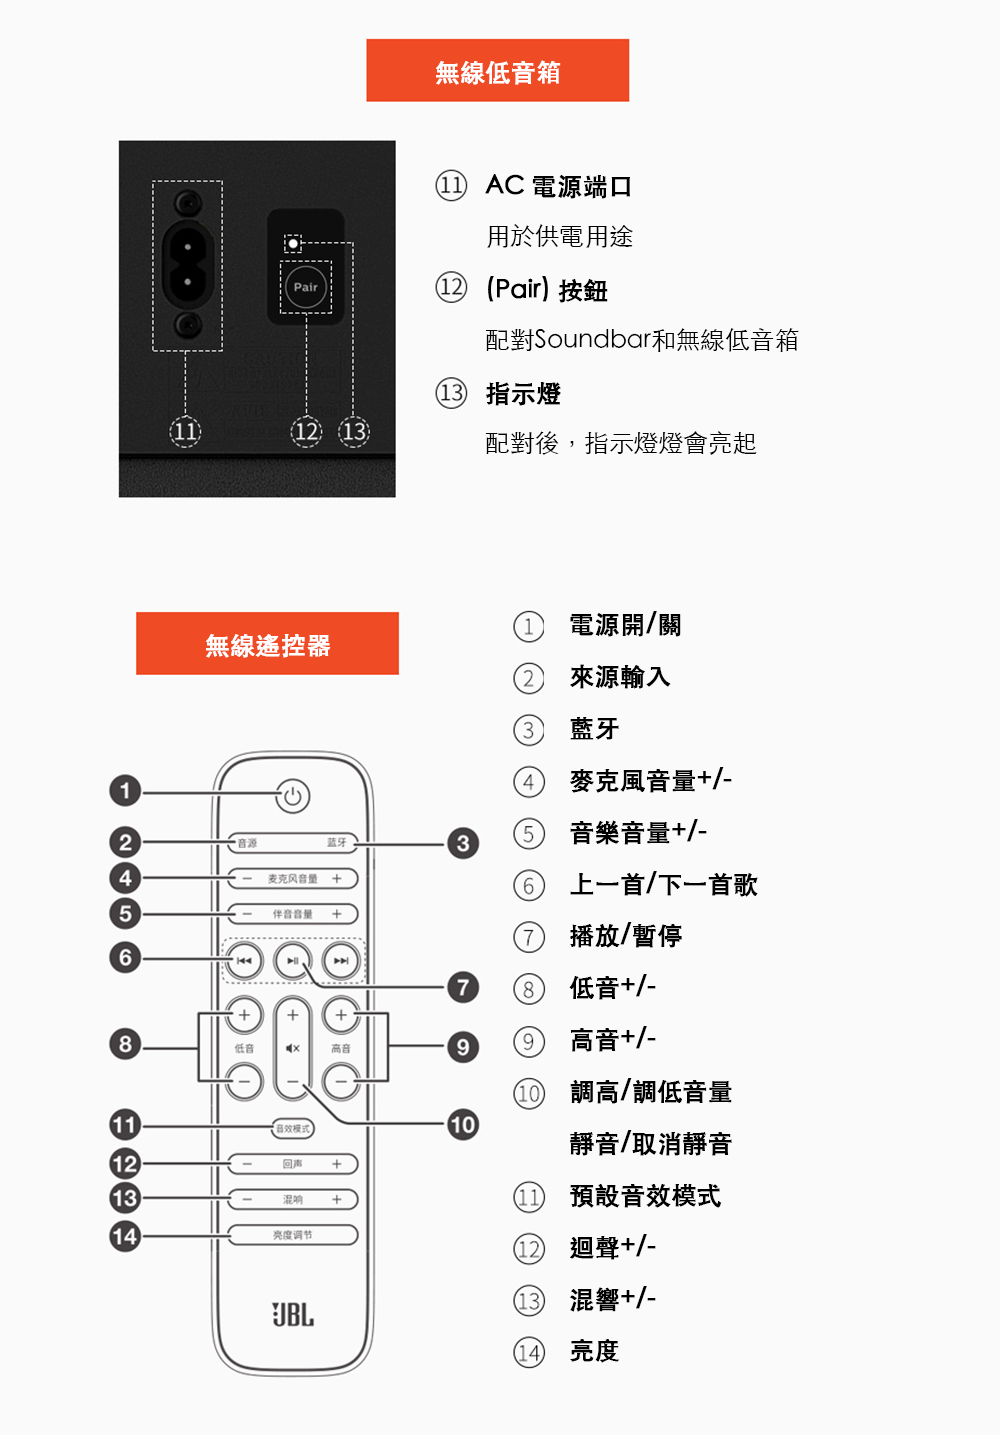 JBL-CINEMA-KTV350-Catalogue-(繁體中文)10.png